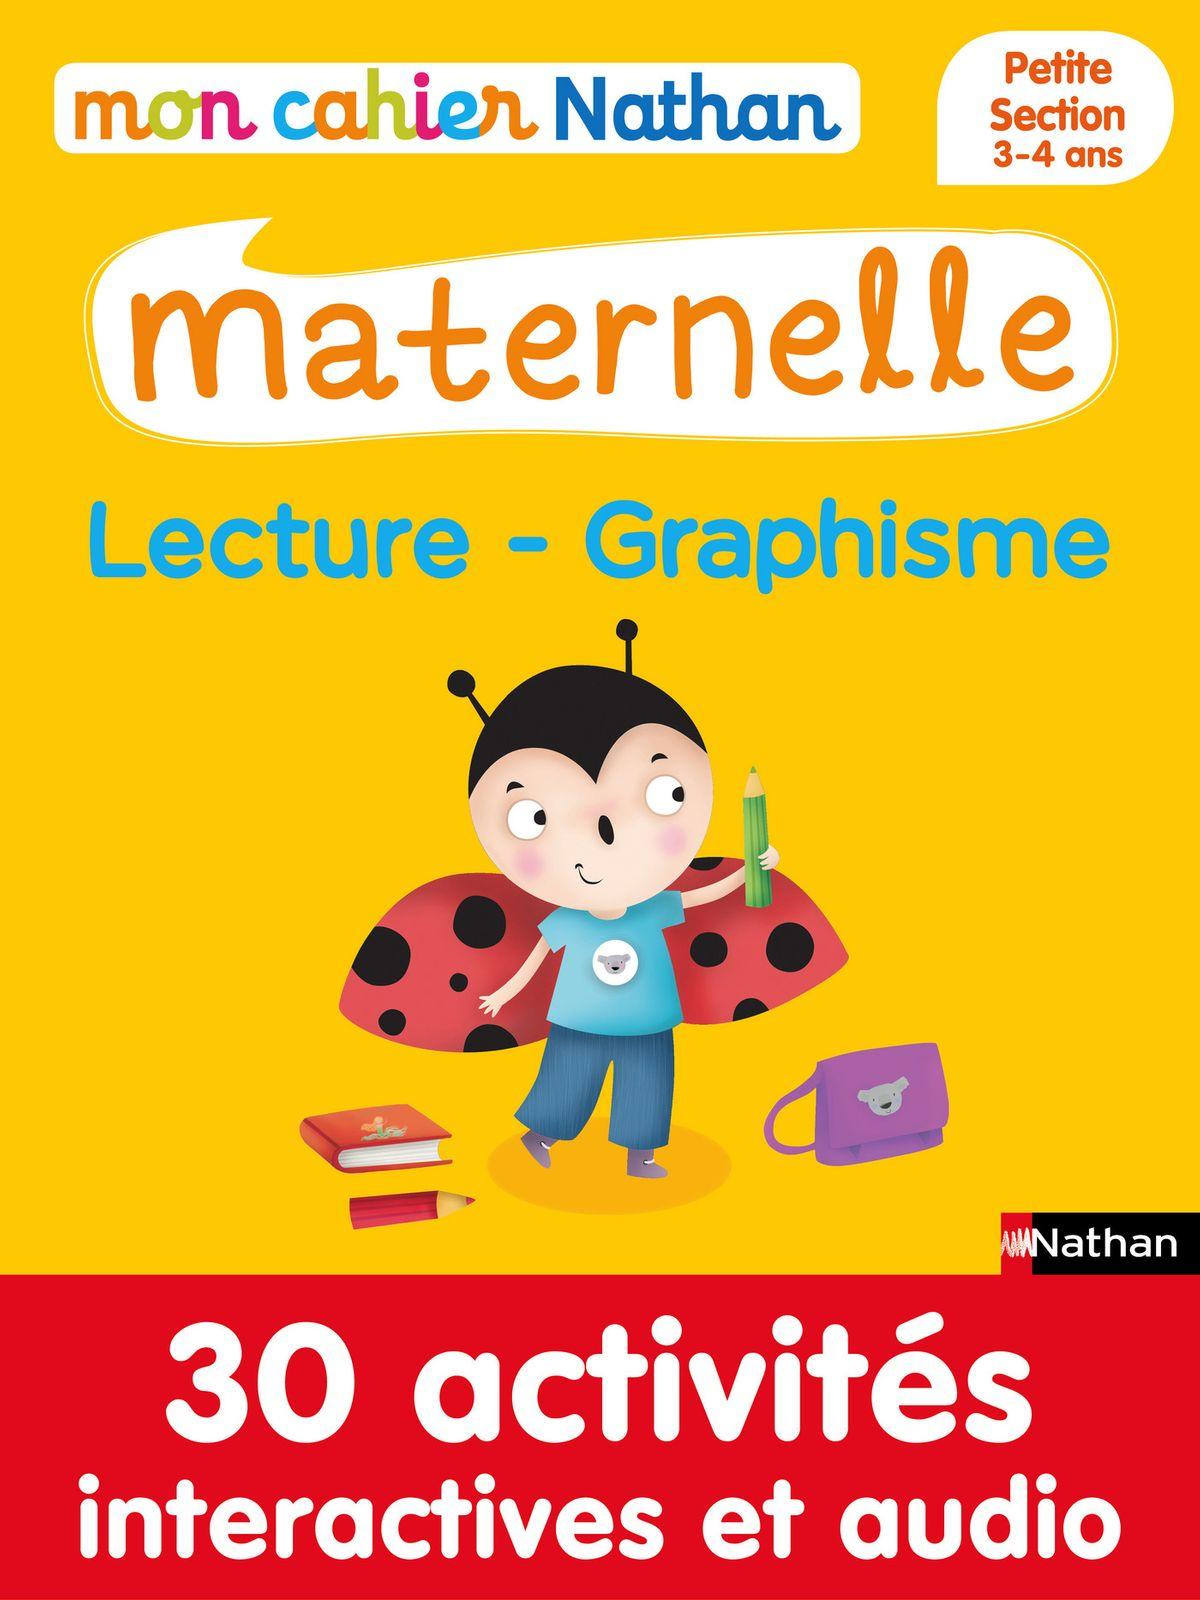 Mon Cahier Maternelle 3/4 Ans Lecture - Graphisme Ebook By Françoise  Kretz-Idas - Rakuten Kobo dedans Livre Graphisme Maternelle